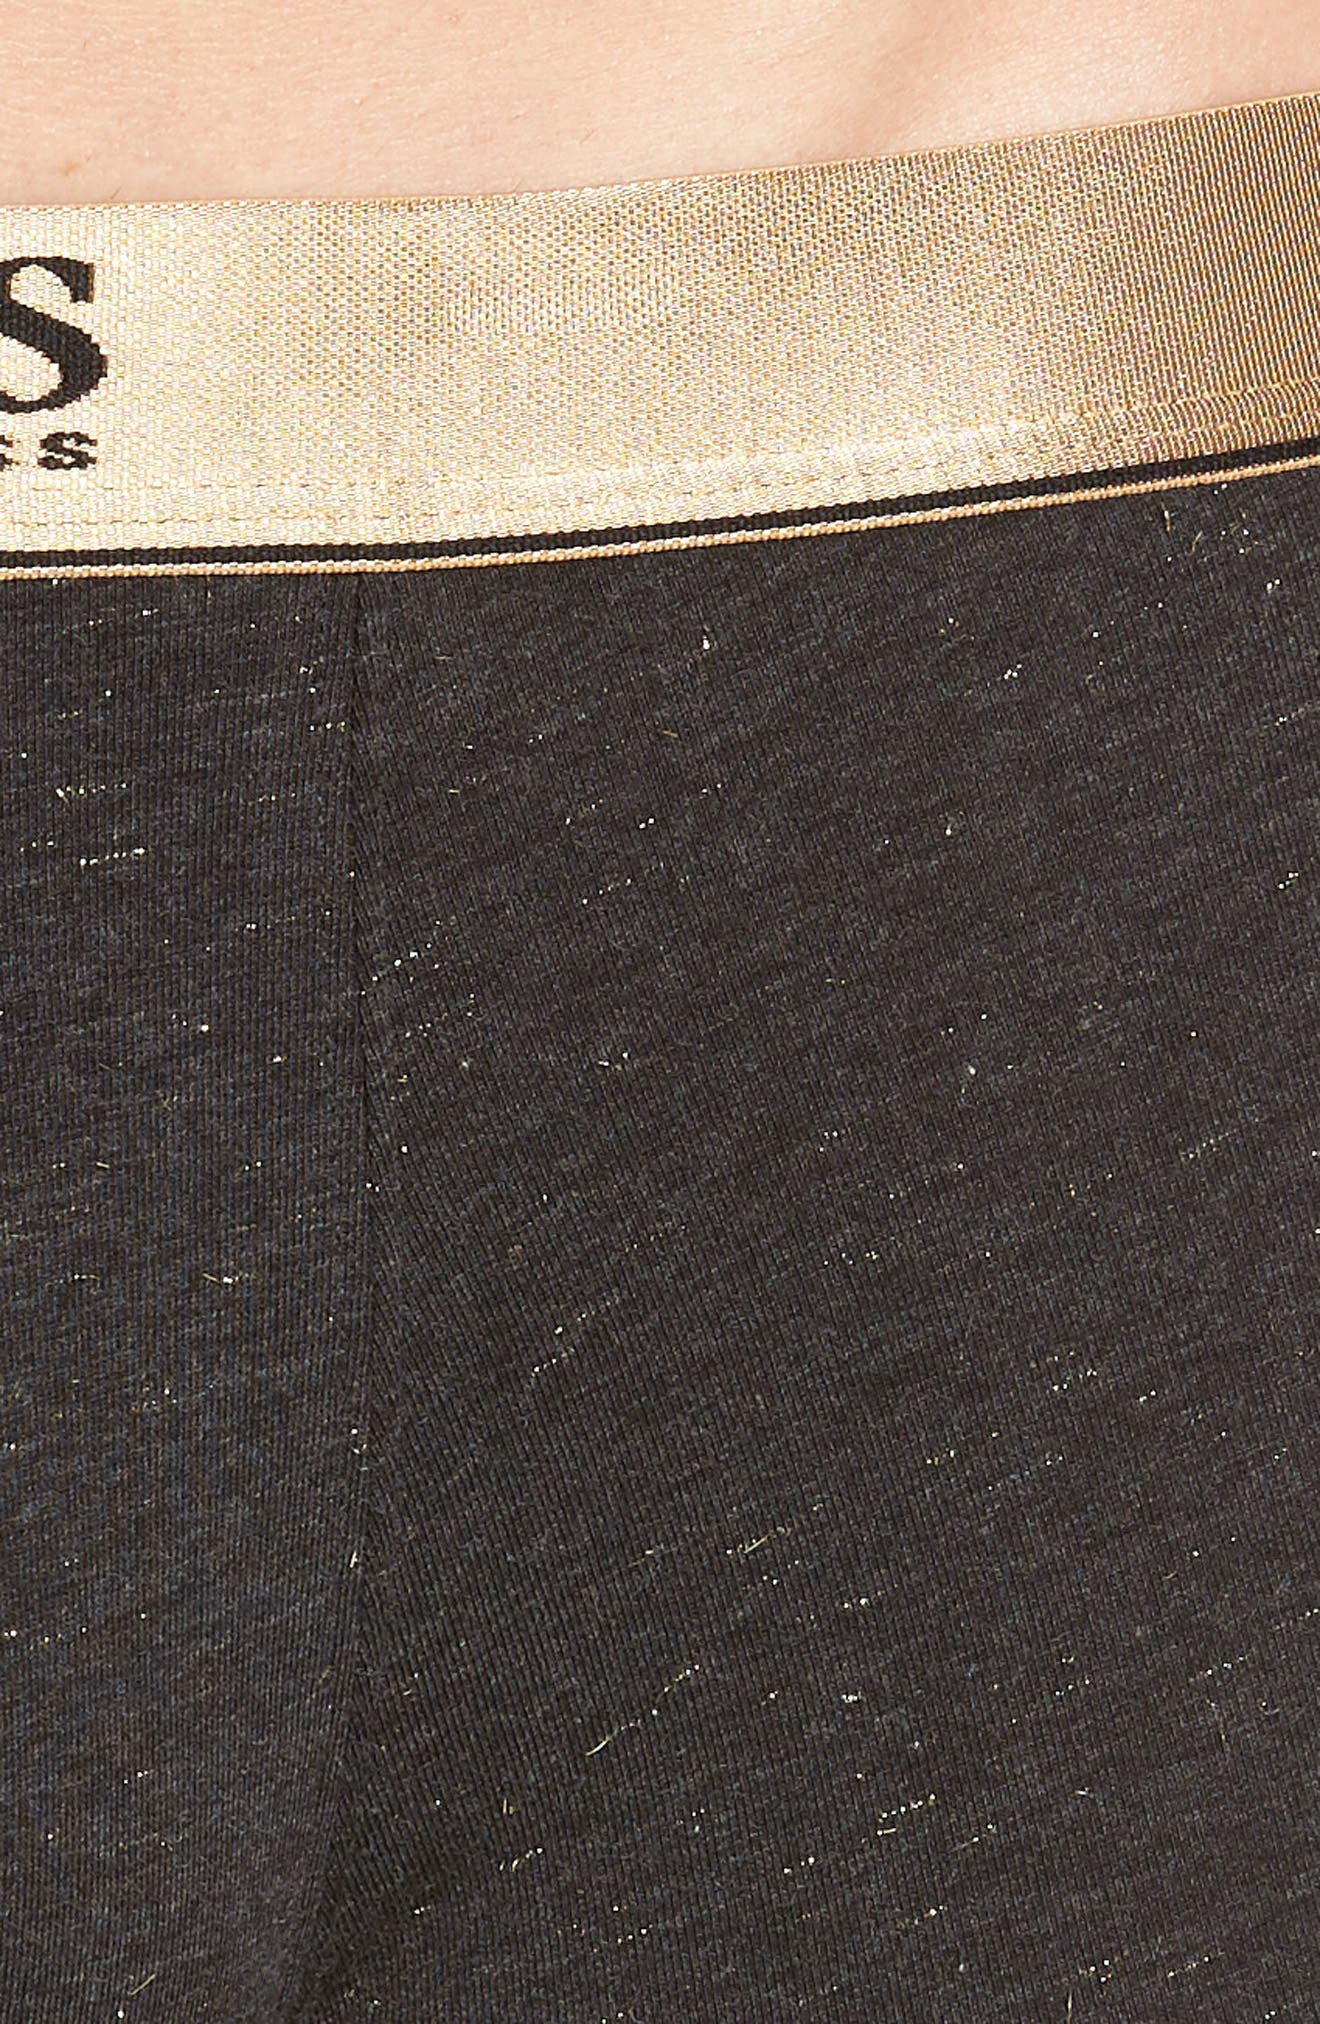 Sparkle Trunks,                             Alternate thumbnail 4, color,                             BLACK